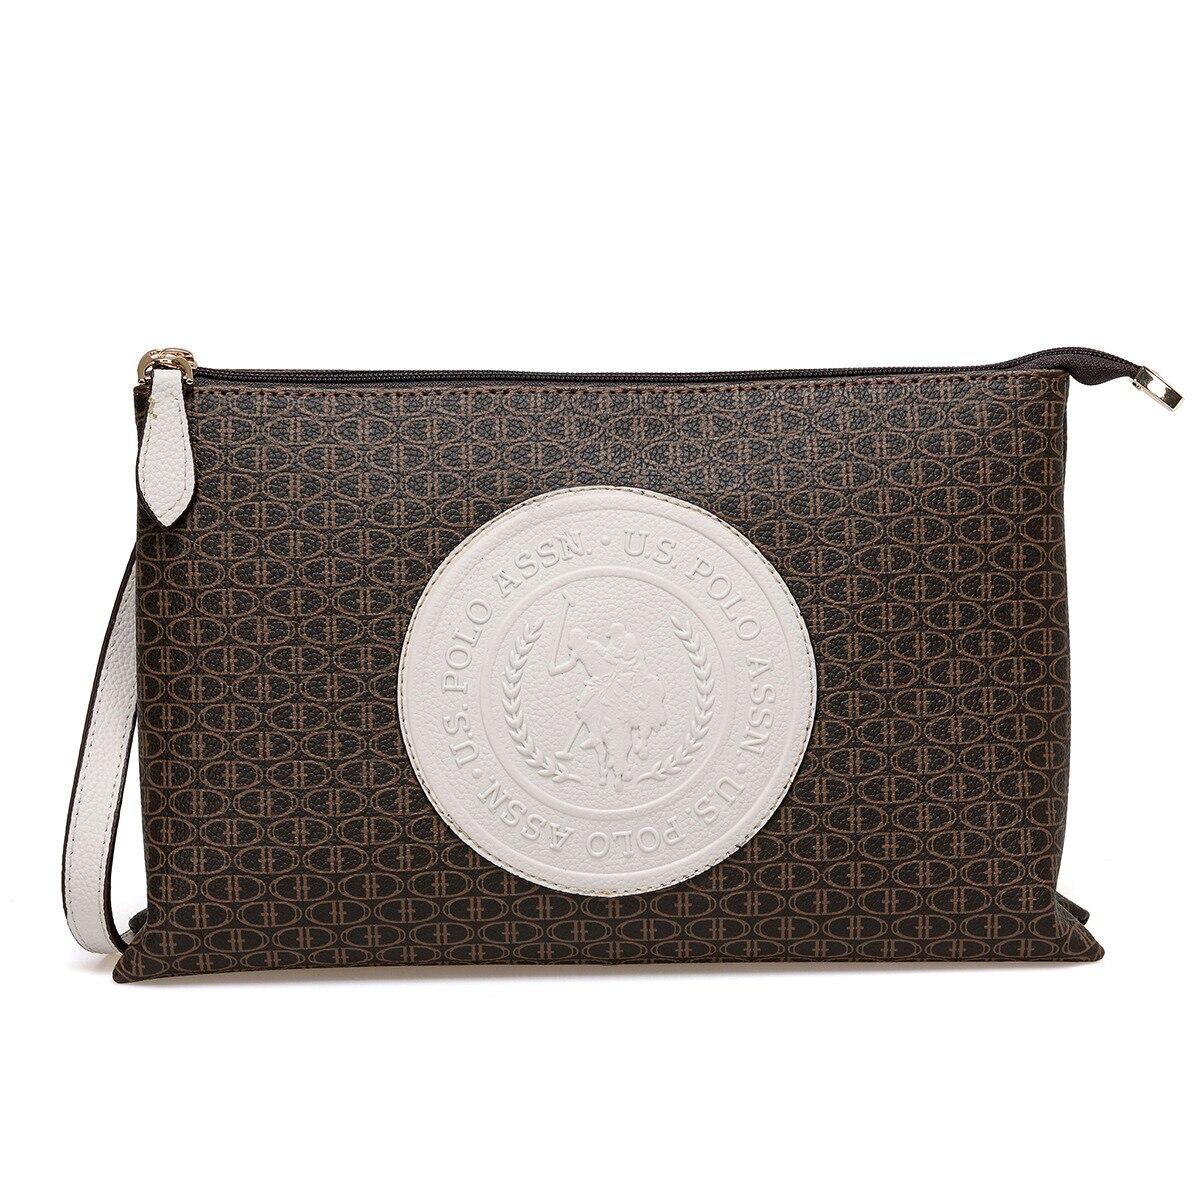 FLO US20223 Brown Women Messenger Bag U.S. POLO ASSN.